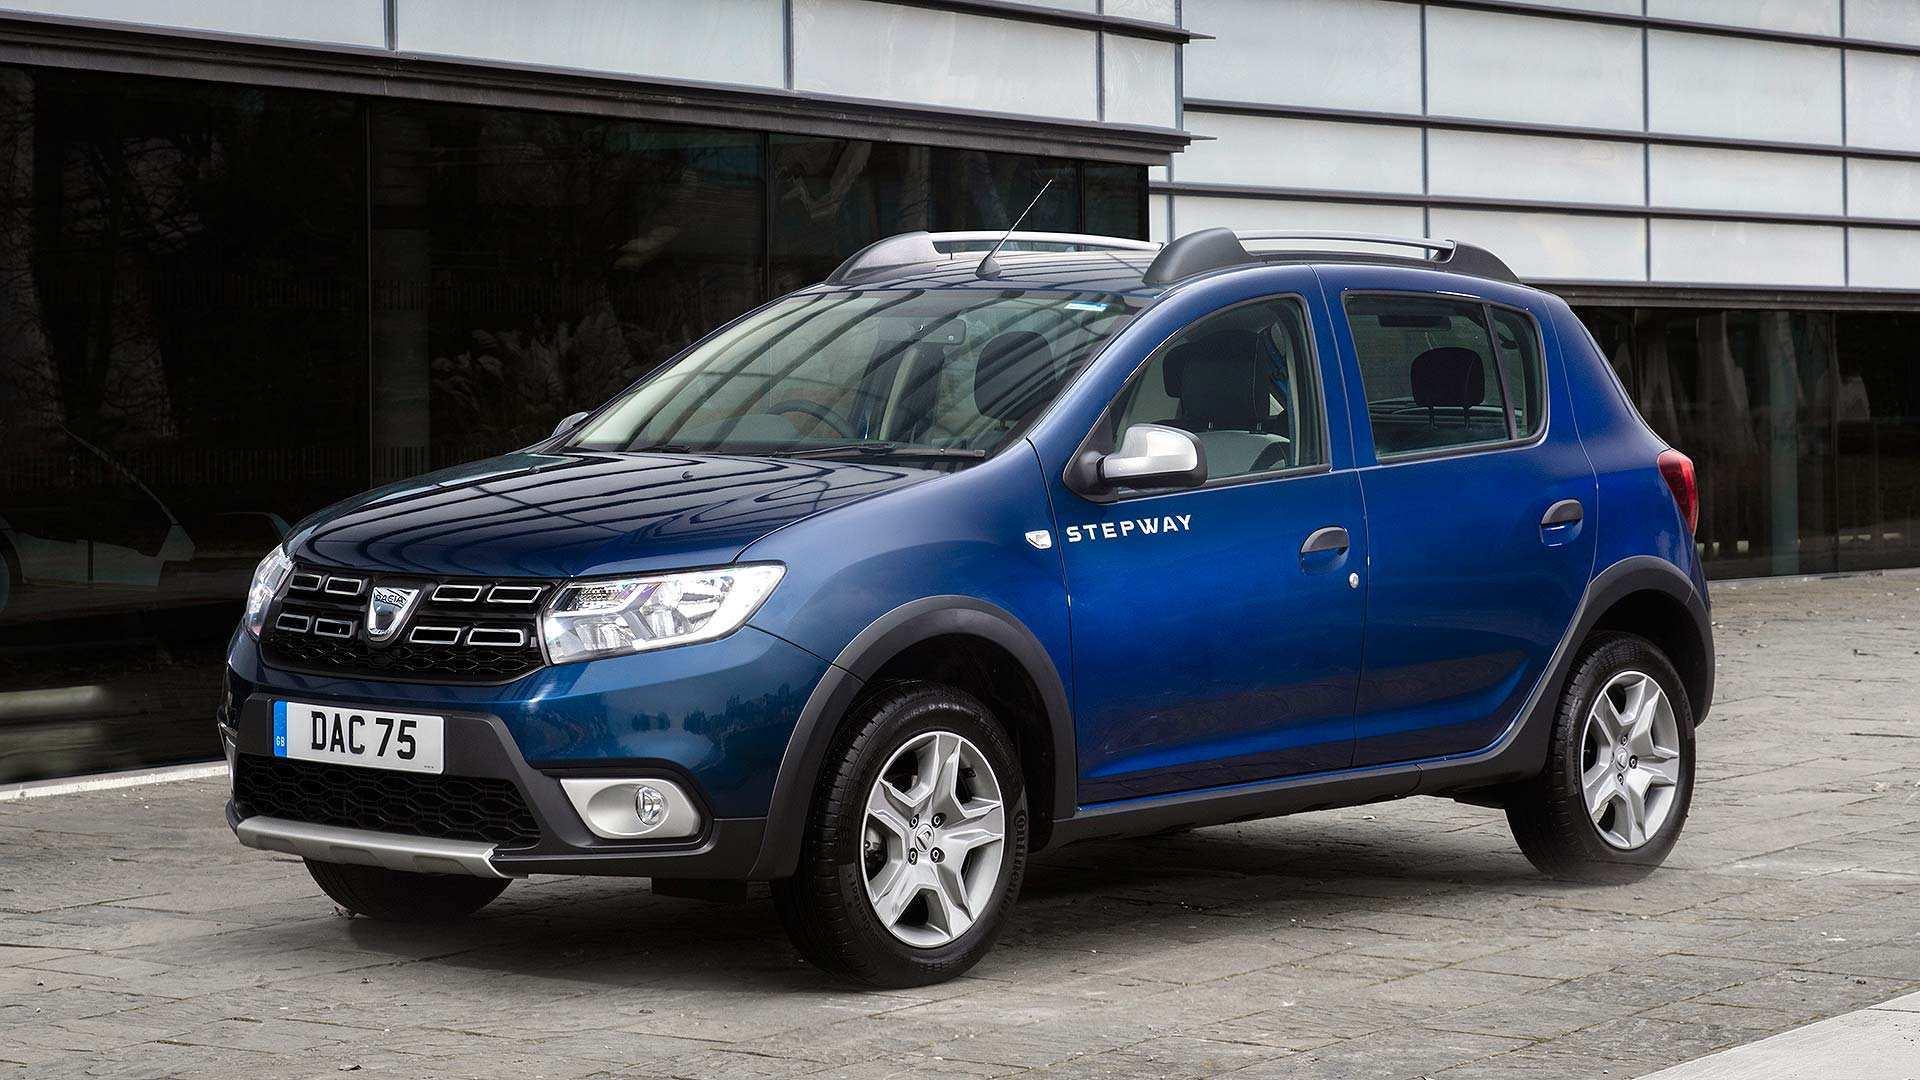 87 All New 2019 Dacia Sandero Stepway Configurations for 2019 Dacia Sandero Stepway